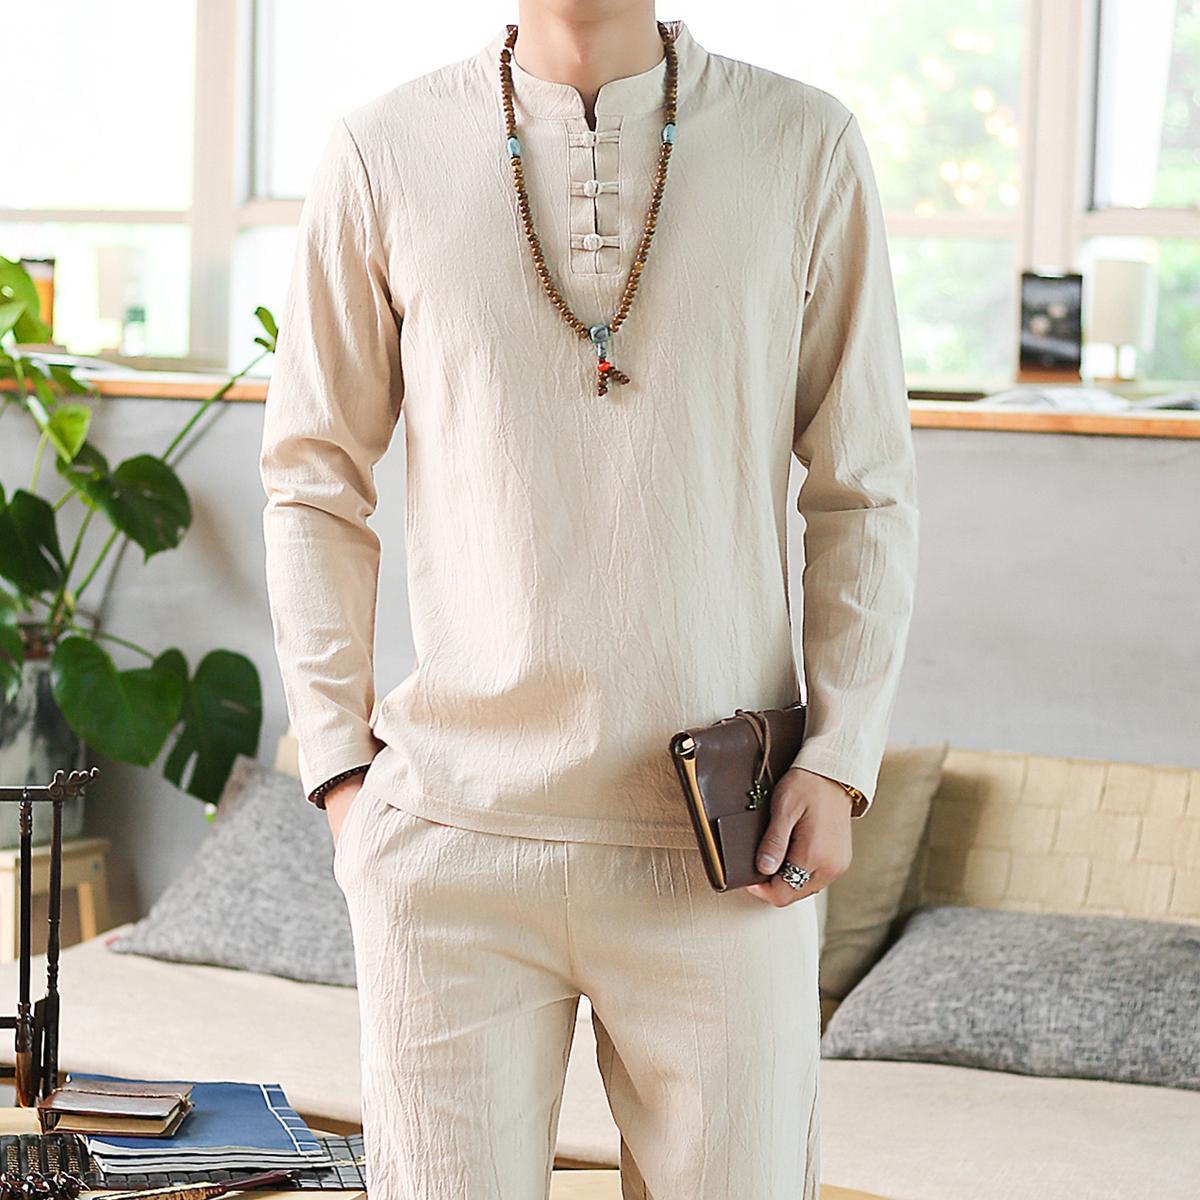 LOLDEAL Summer Men's Long Sleeve Pants Set Linen Chinese Large Size Men's Solid Color Long Sleeve T-Shirt Set